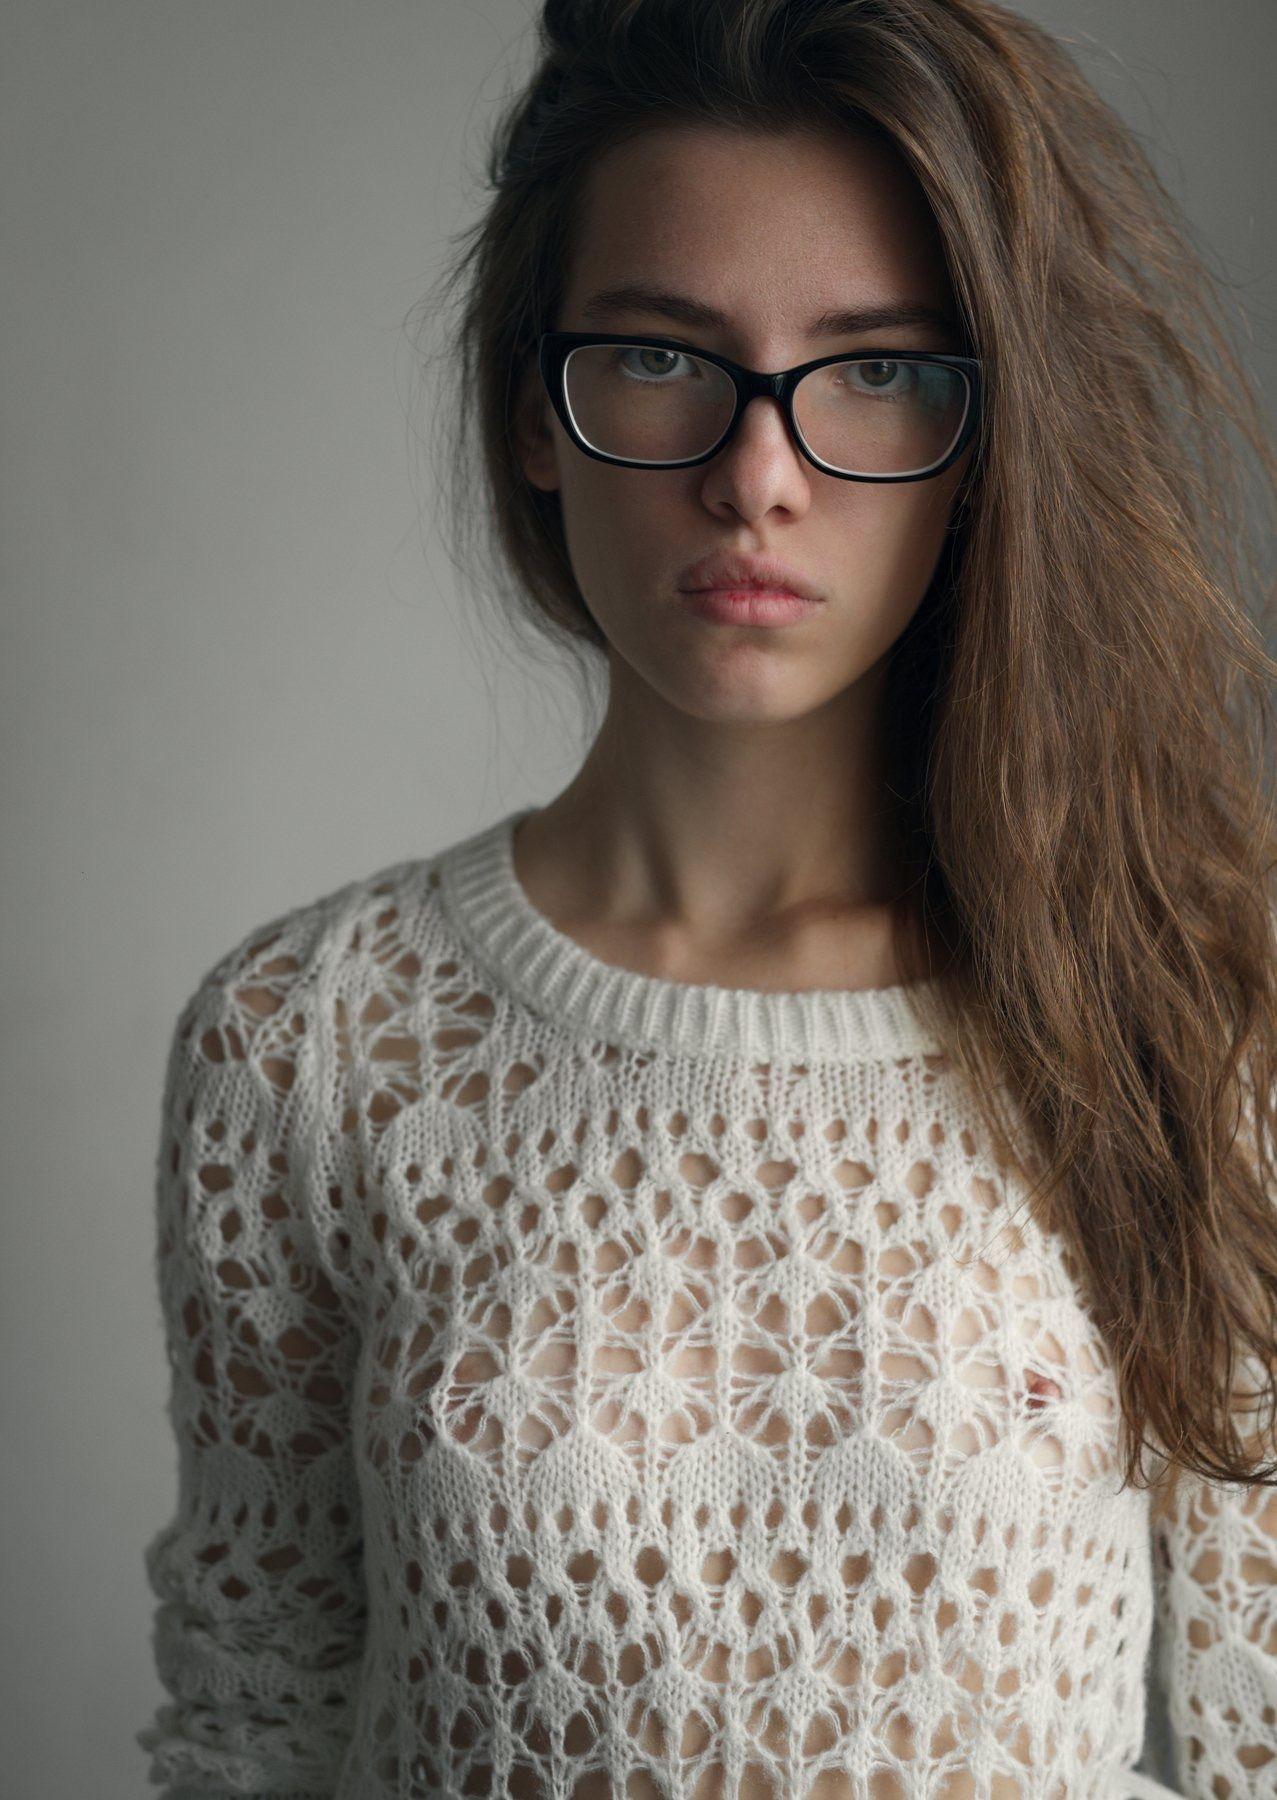 Maya Kovalenko - Hire at Ithire